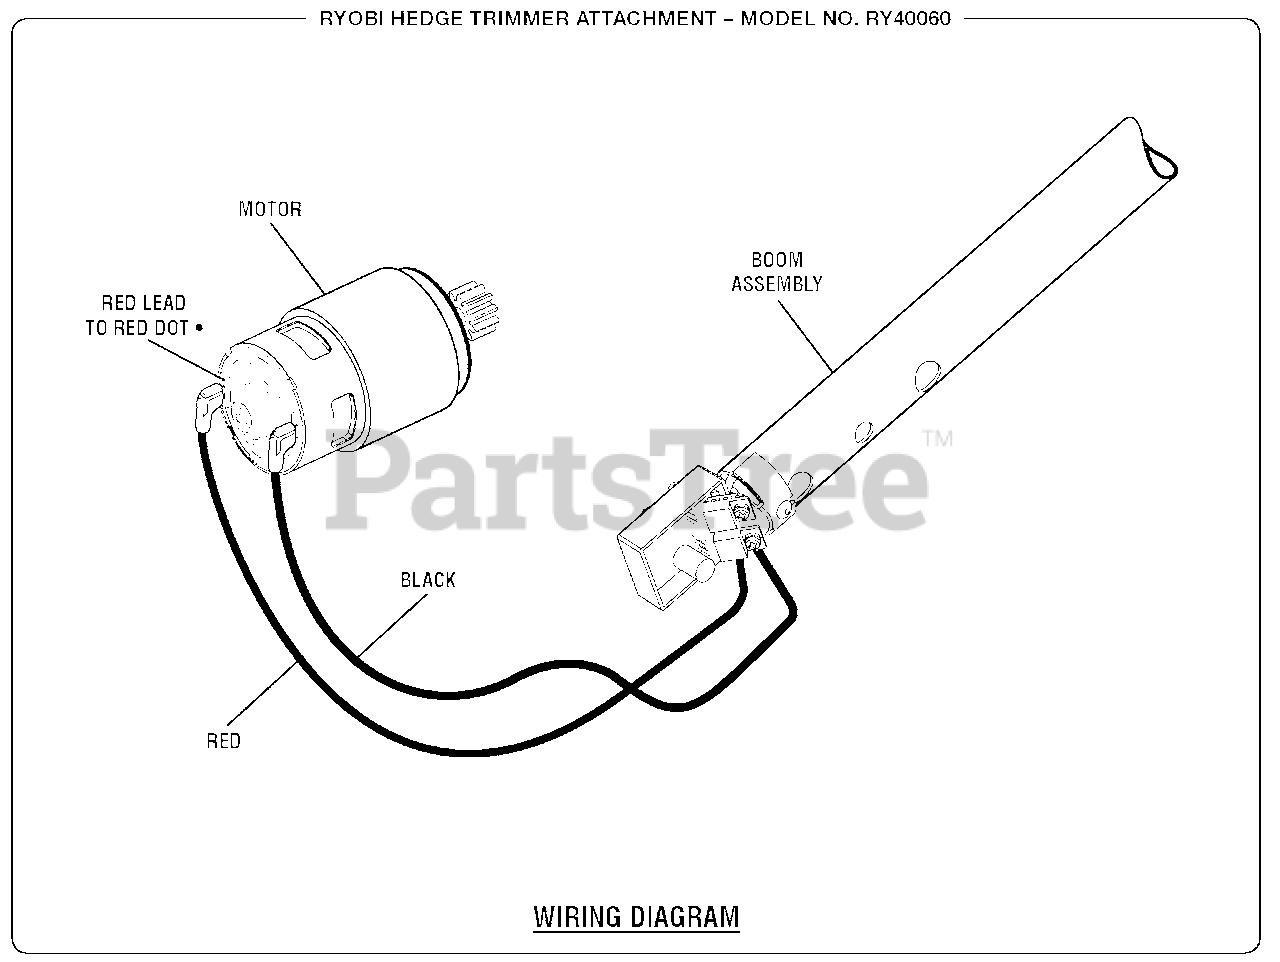 ryobi engine diagram ryobi ry 40060 ryobi hedge trimmer wiring diagram parts lookup  ryobi ry 40060 ryobi hedge trimmer